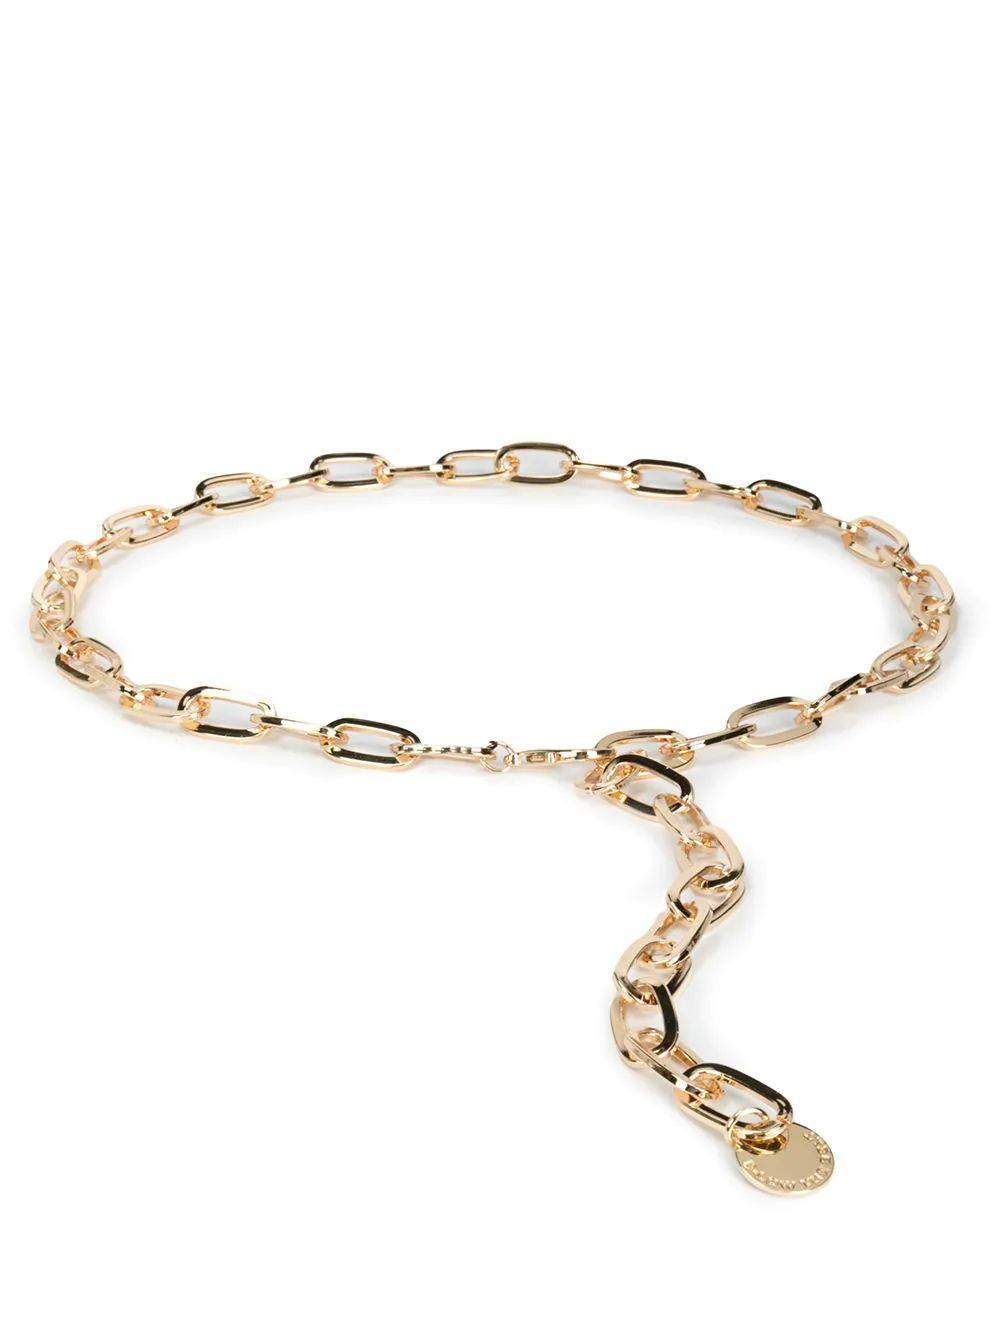 Isla Chain Belt Item # BH833-000CH